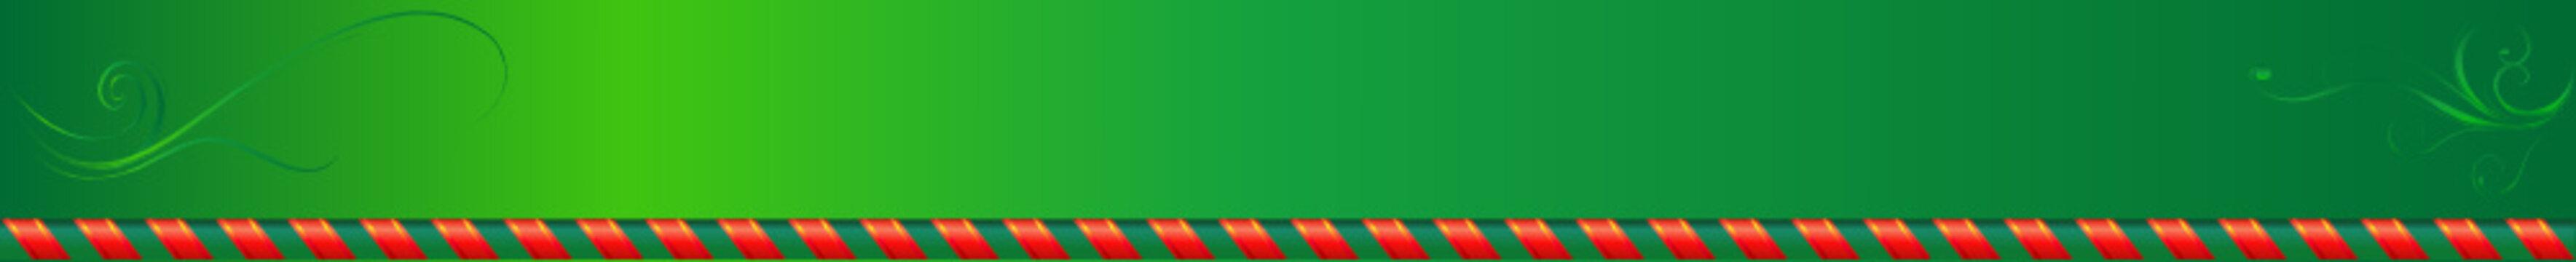 bandeau vert